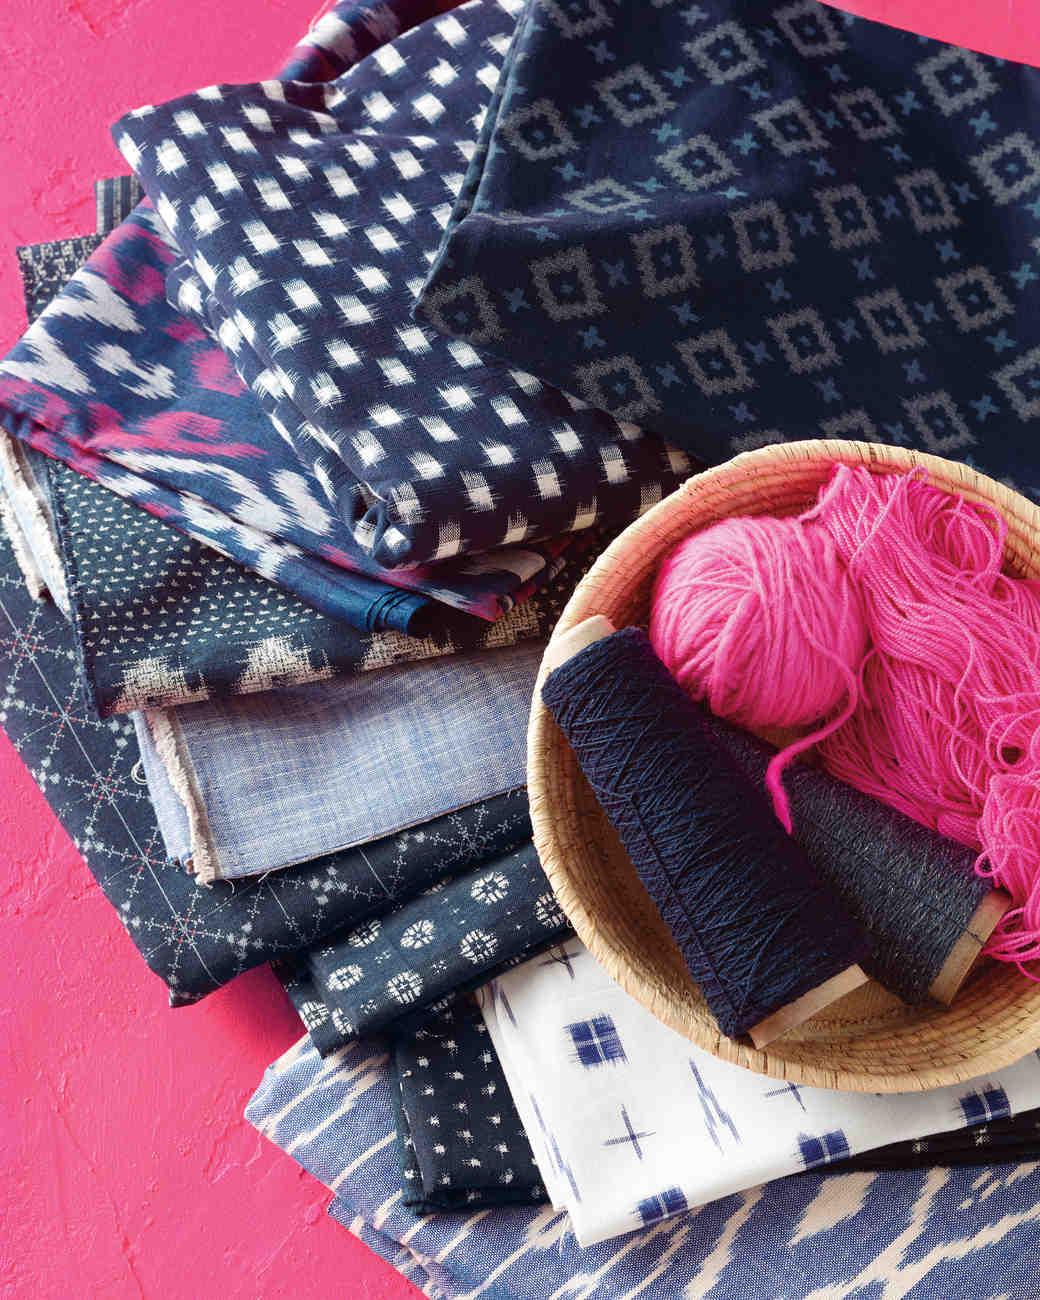 opener-textiles659l-mwd110739.jpg